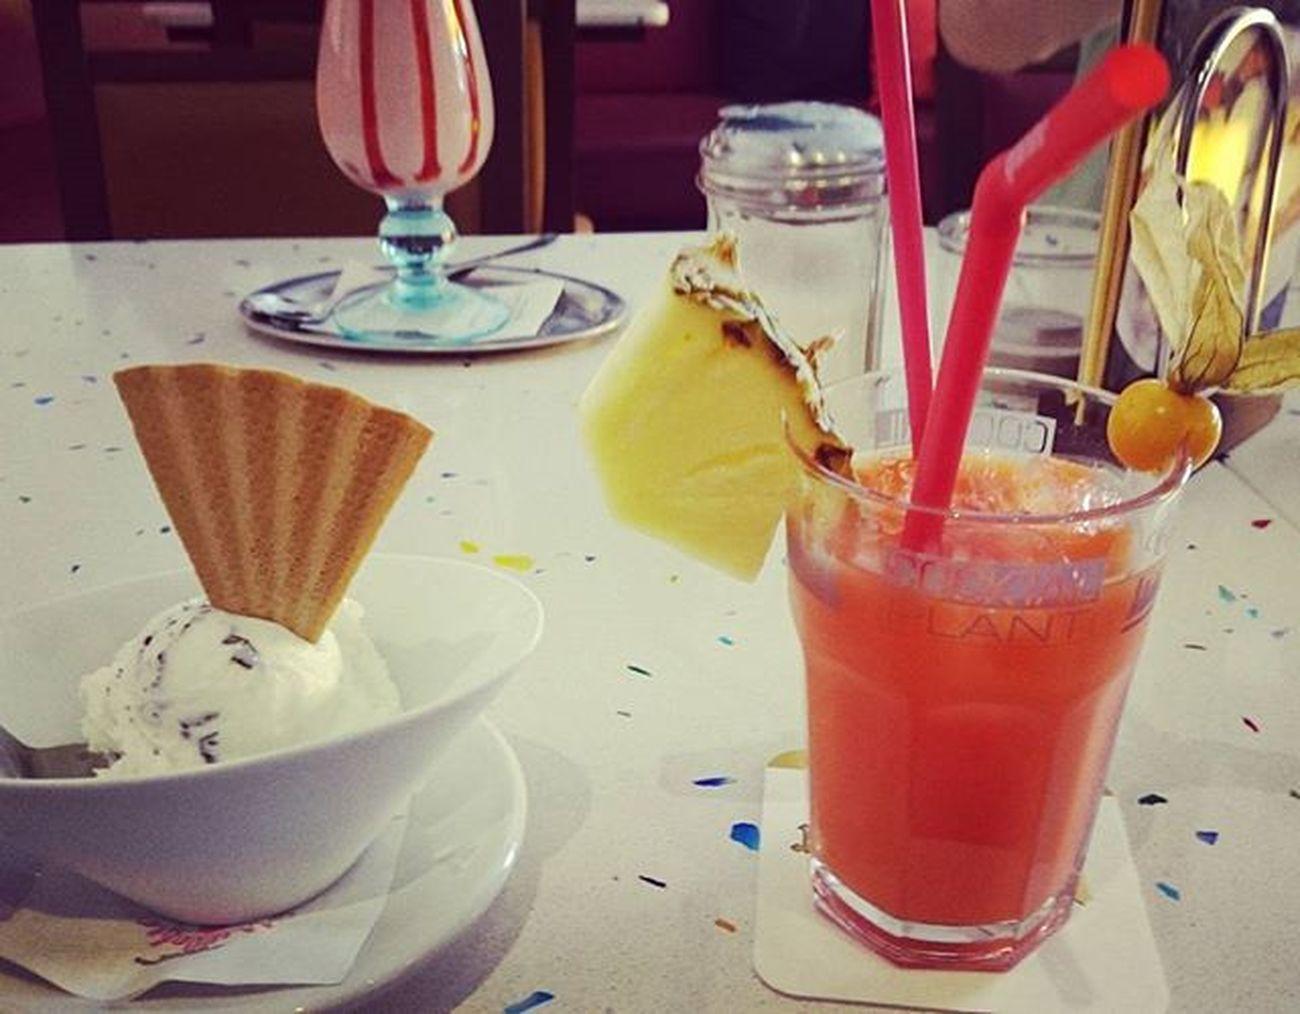 Gutgehnlassen Berlinspandau Cafe Hipster Maitai Cocktail Nuss Eis Straciatella Lecker Dad Birthday